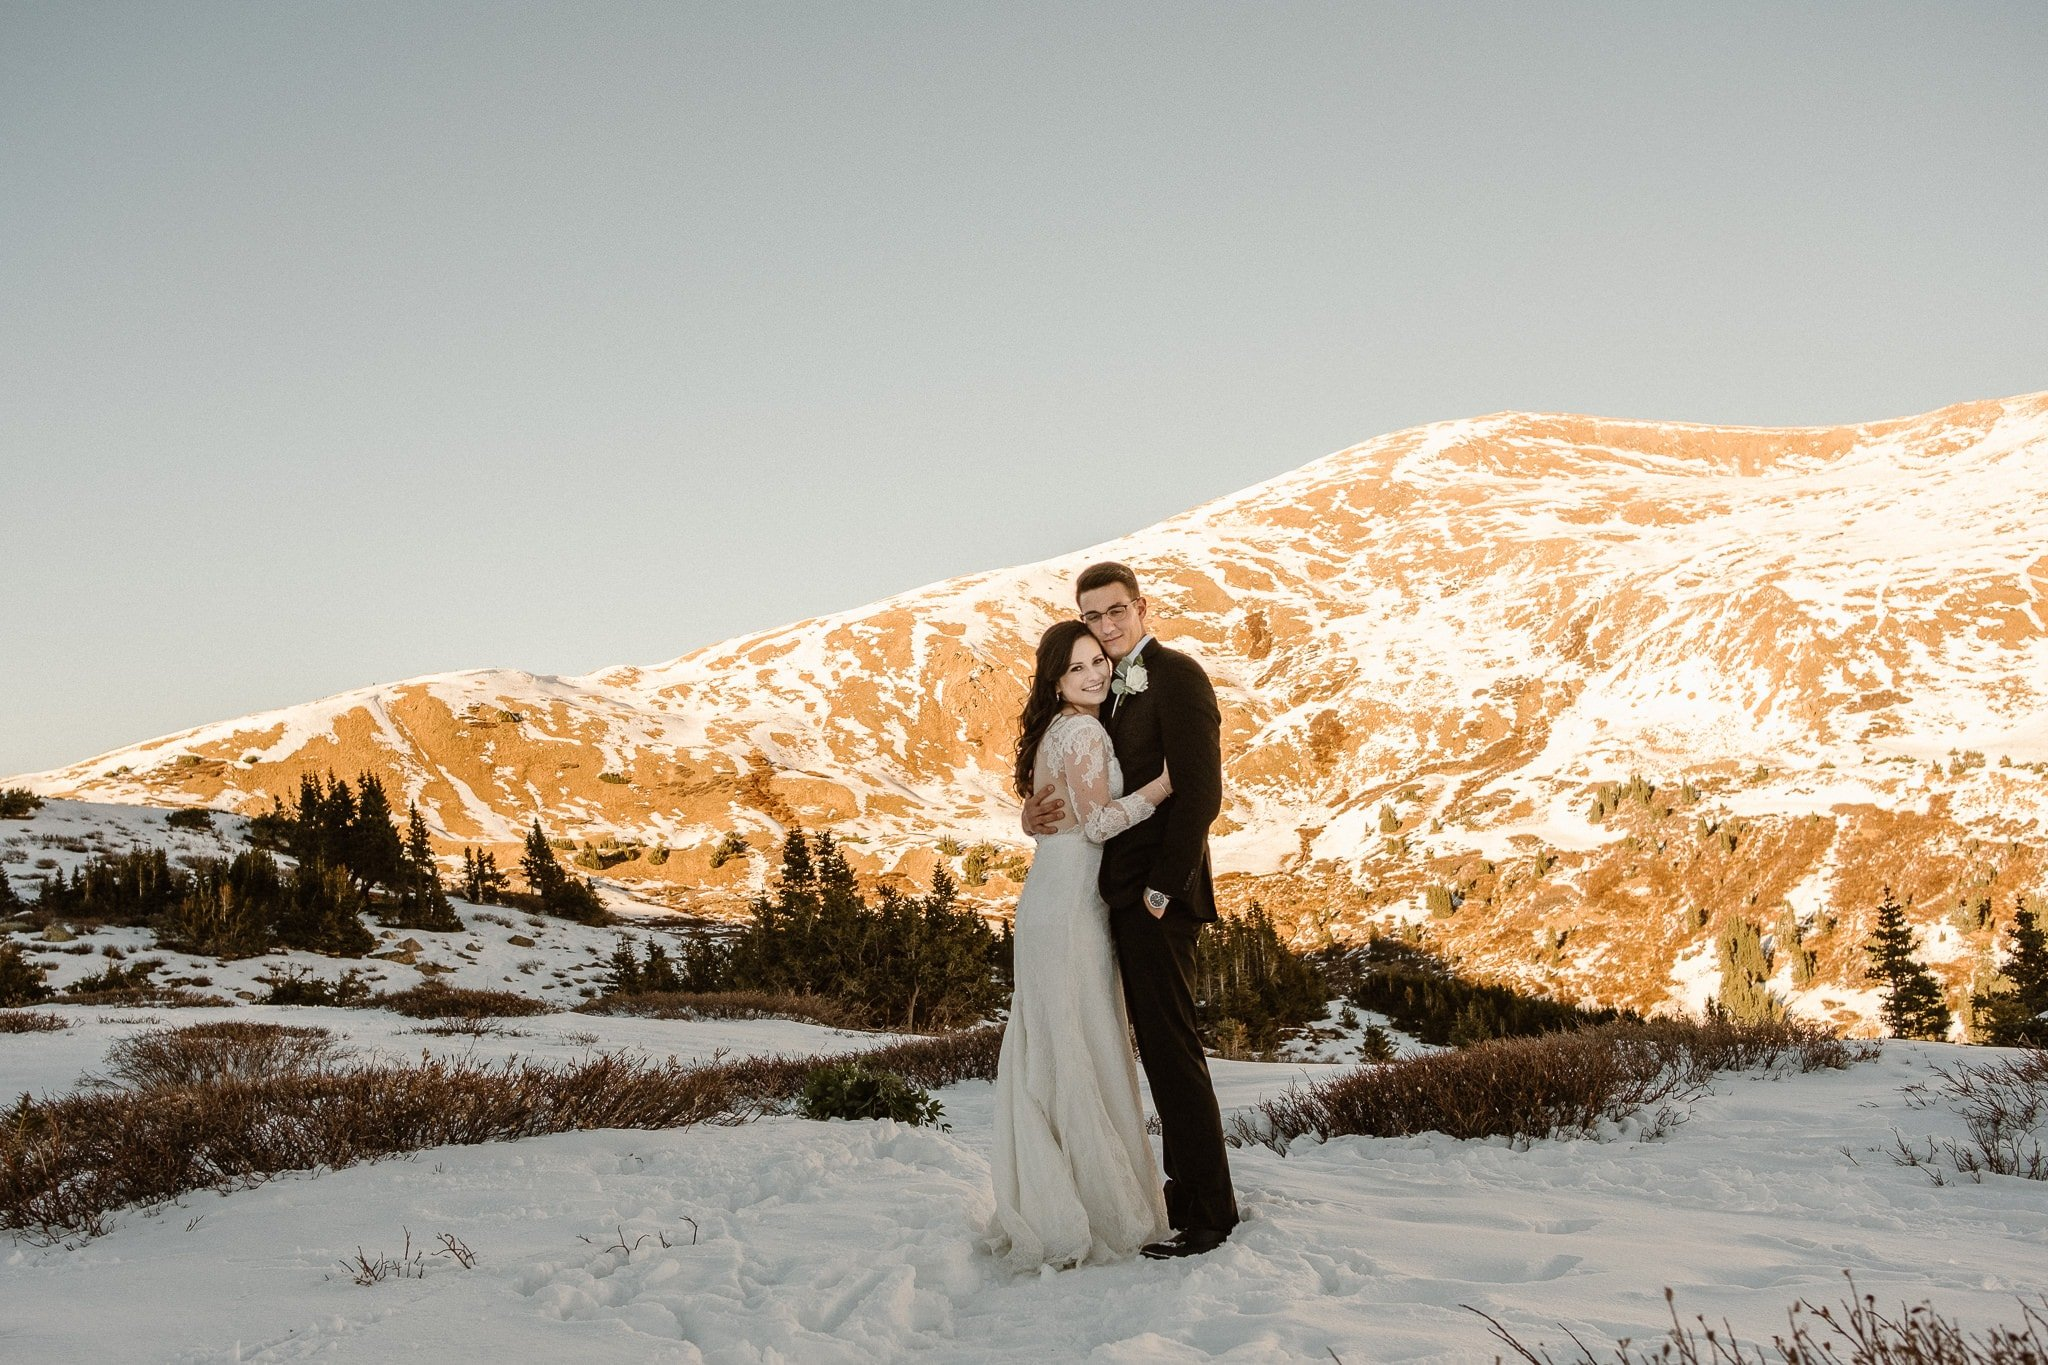 Colorado winter elopement photographer, Loveland Pass mountain elopement, adventure elopement photographer, bride and groom portraits in snow